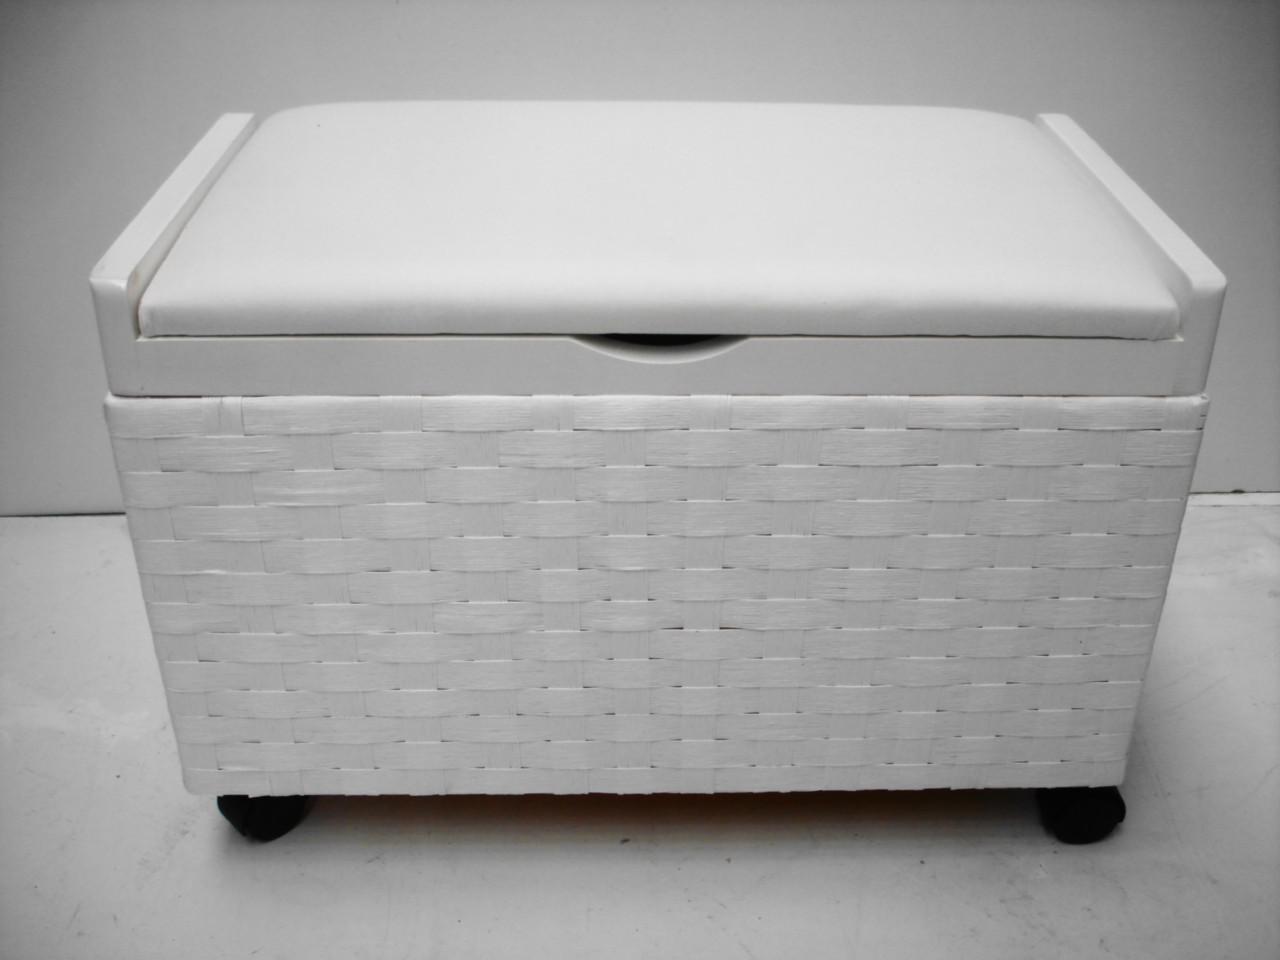 white shabby chic toy box laundry basket storage trunk. Black Bedroom Furniture Sets. Home Design Ideas